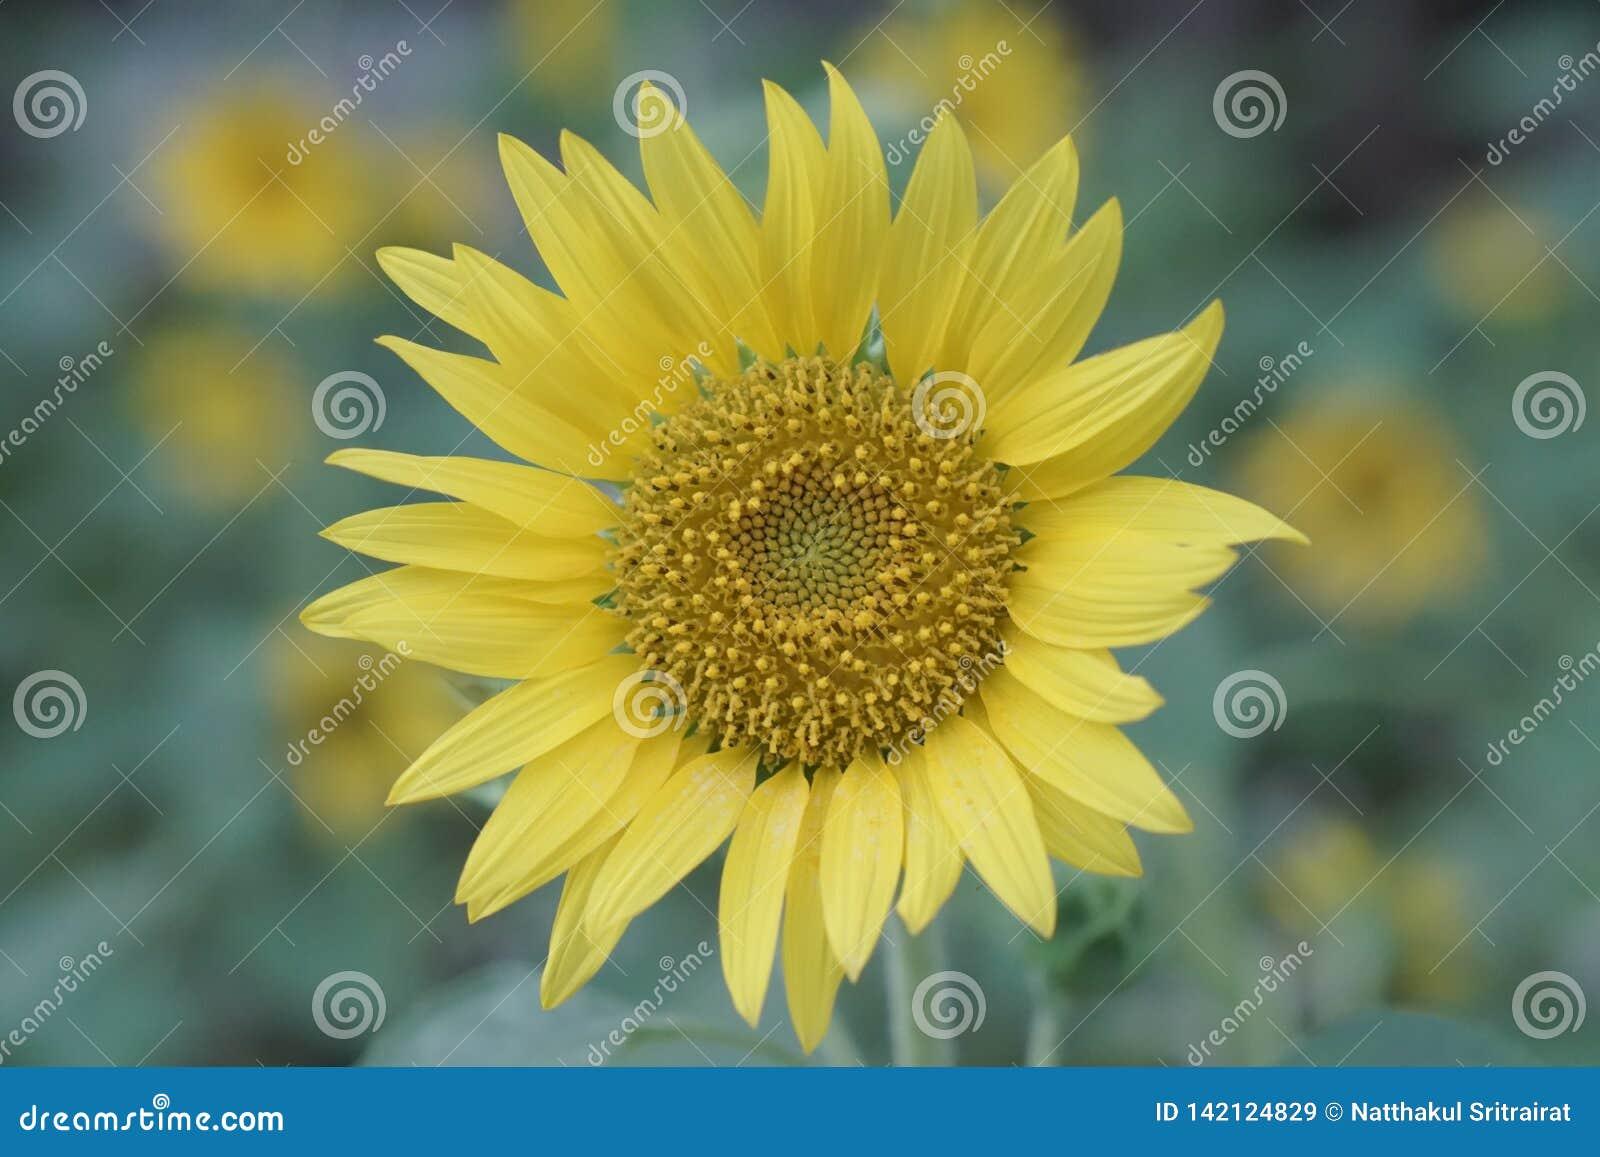 Die gelbe Sonnenblume